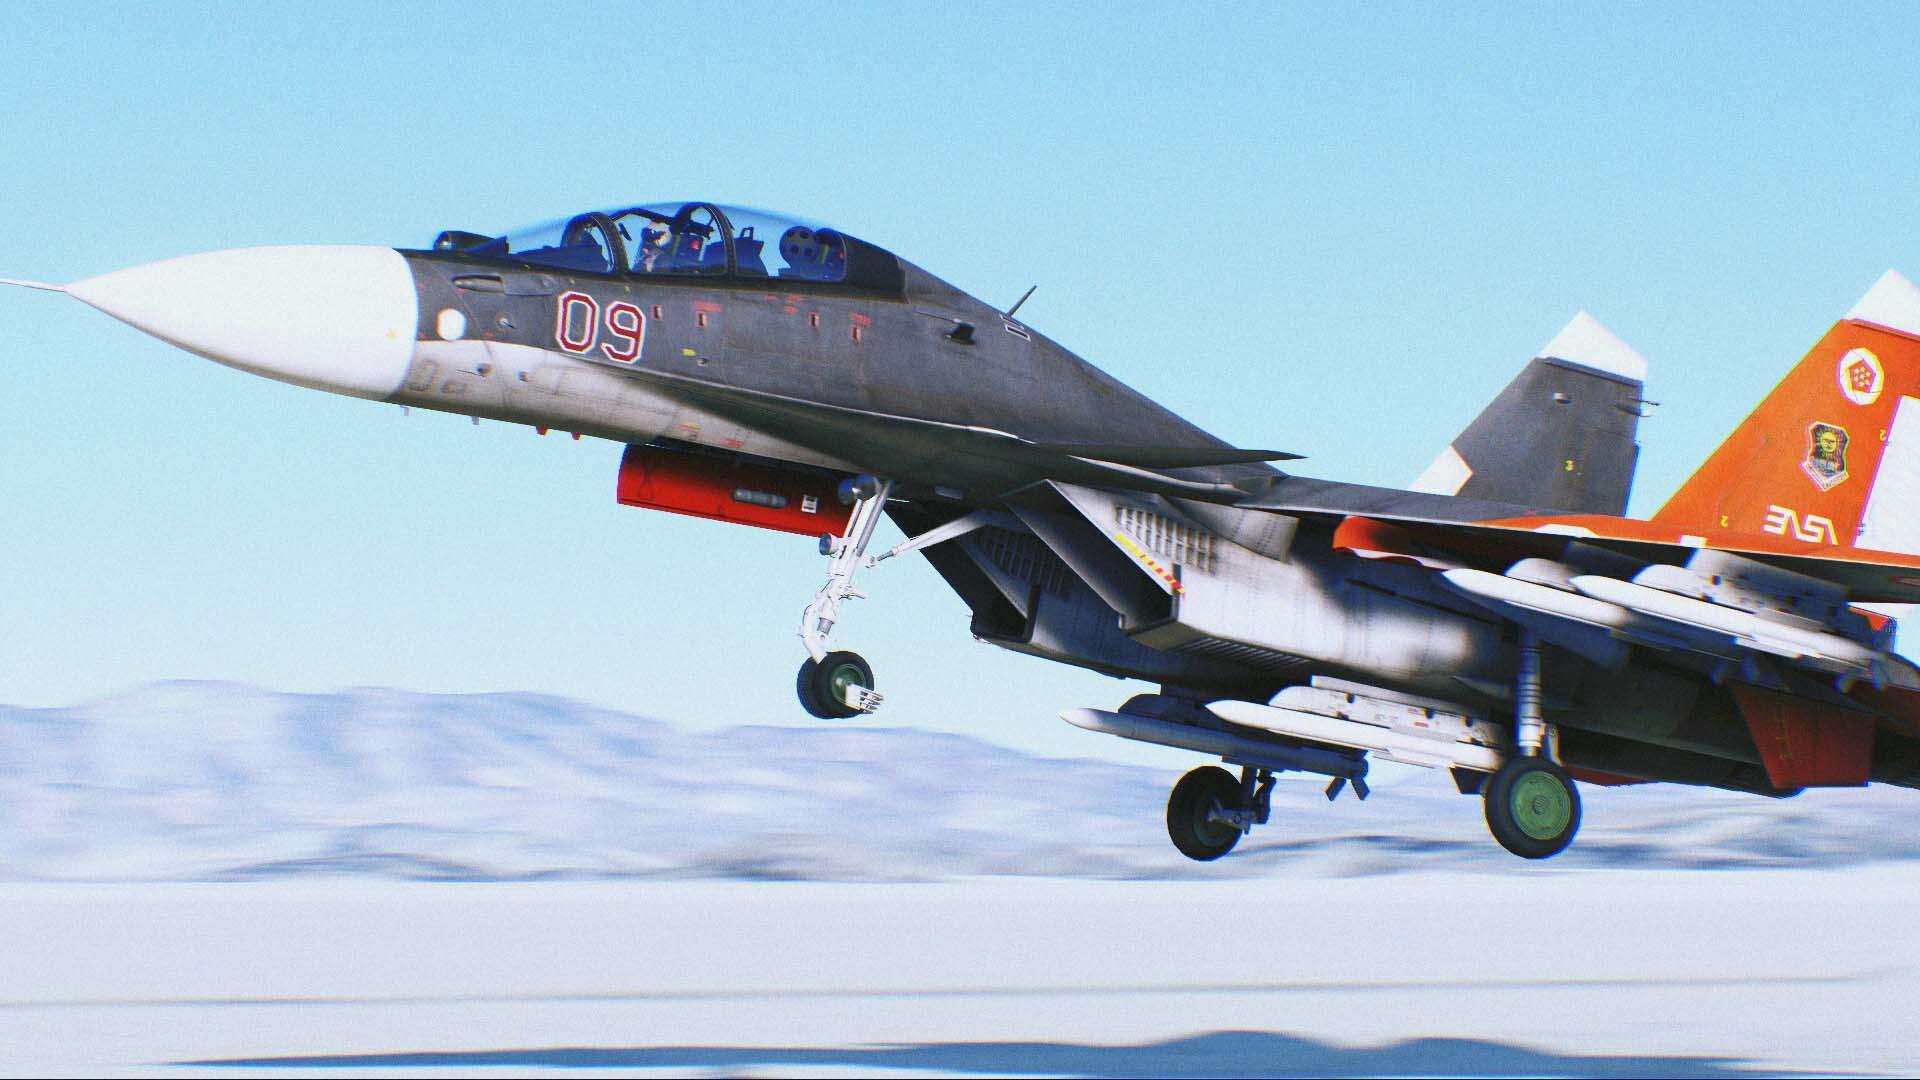 ace-combat-7-08-22-17-14.jpg